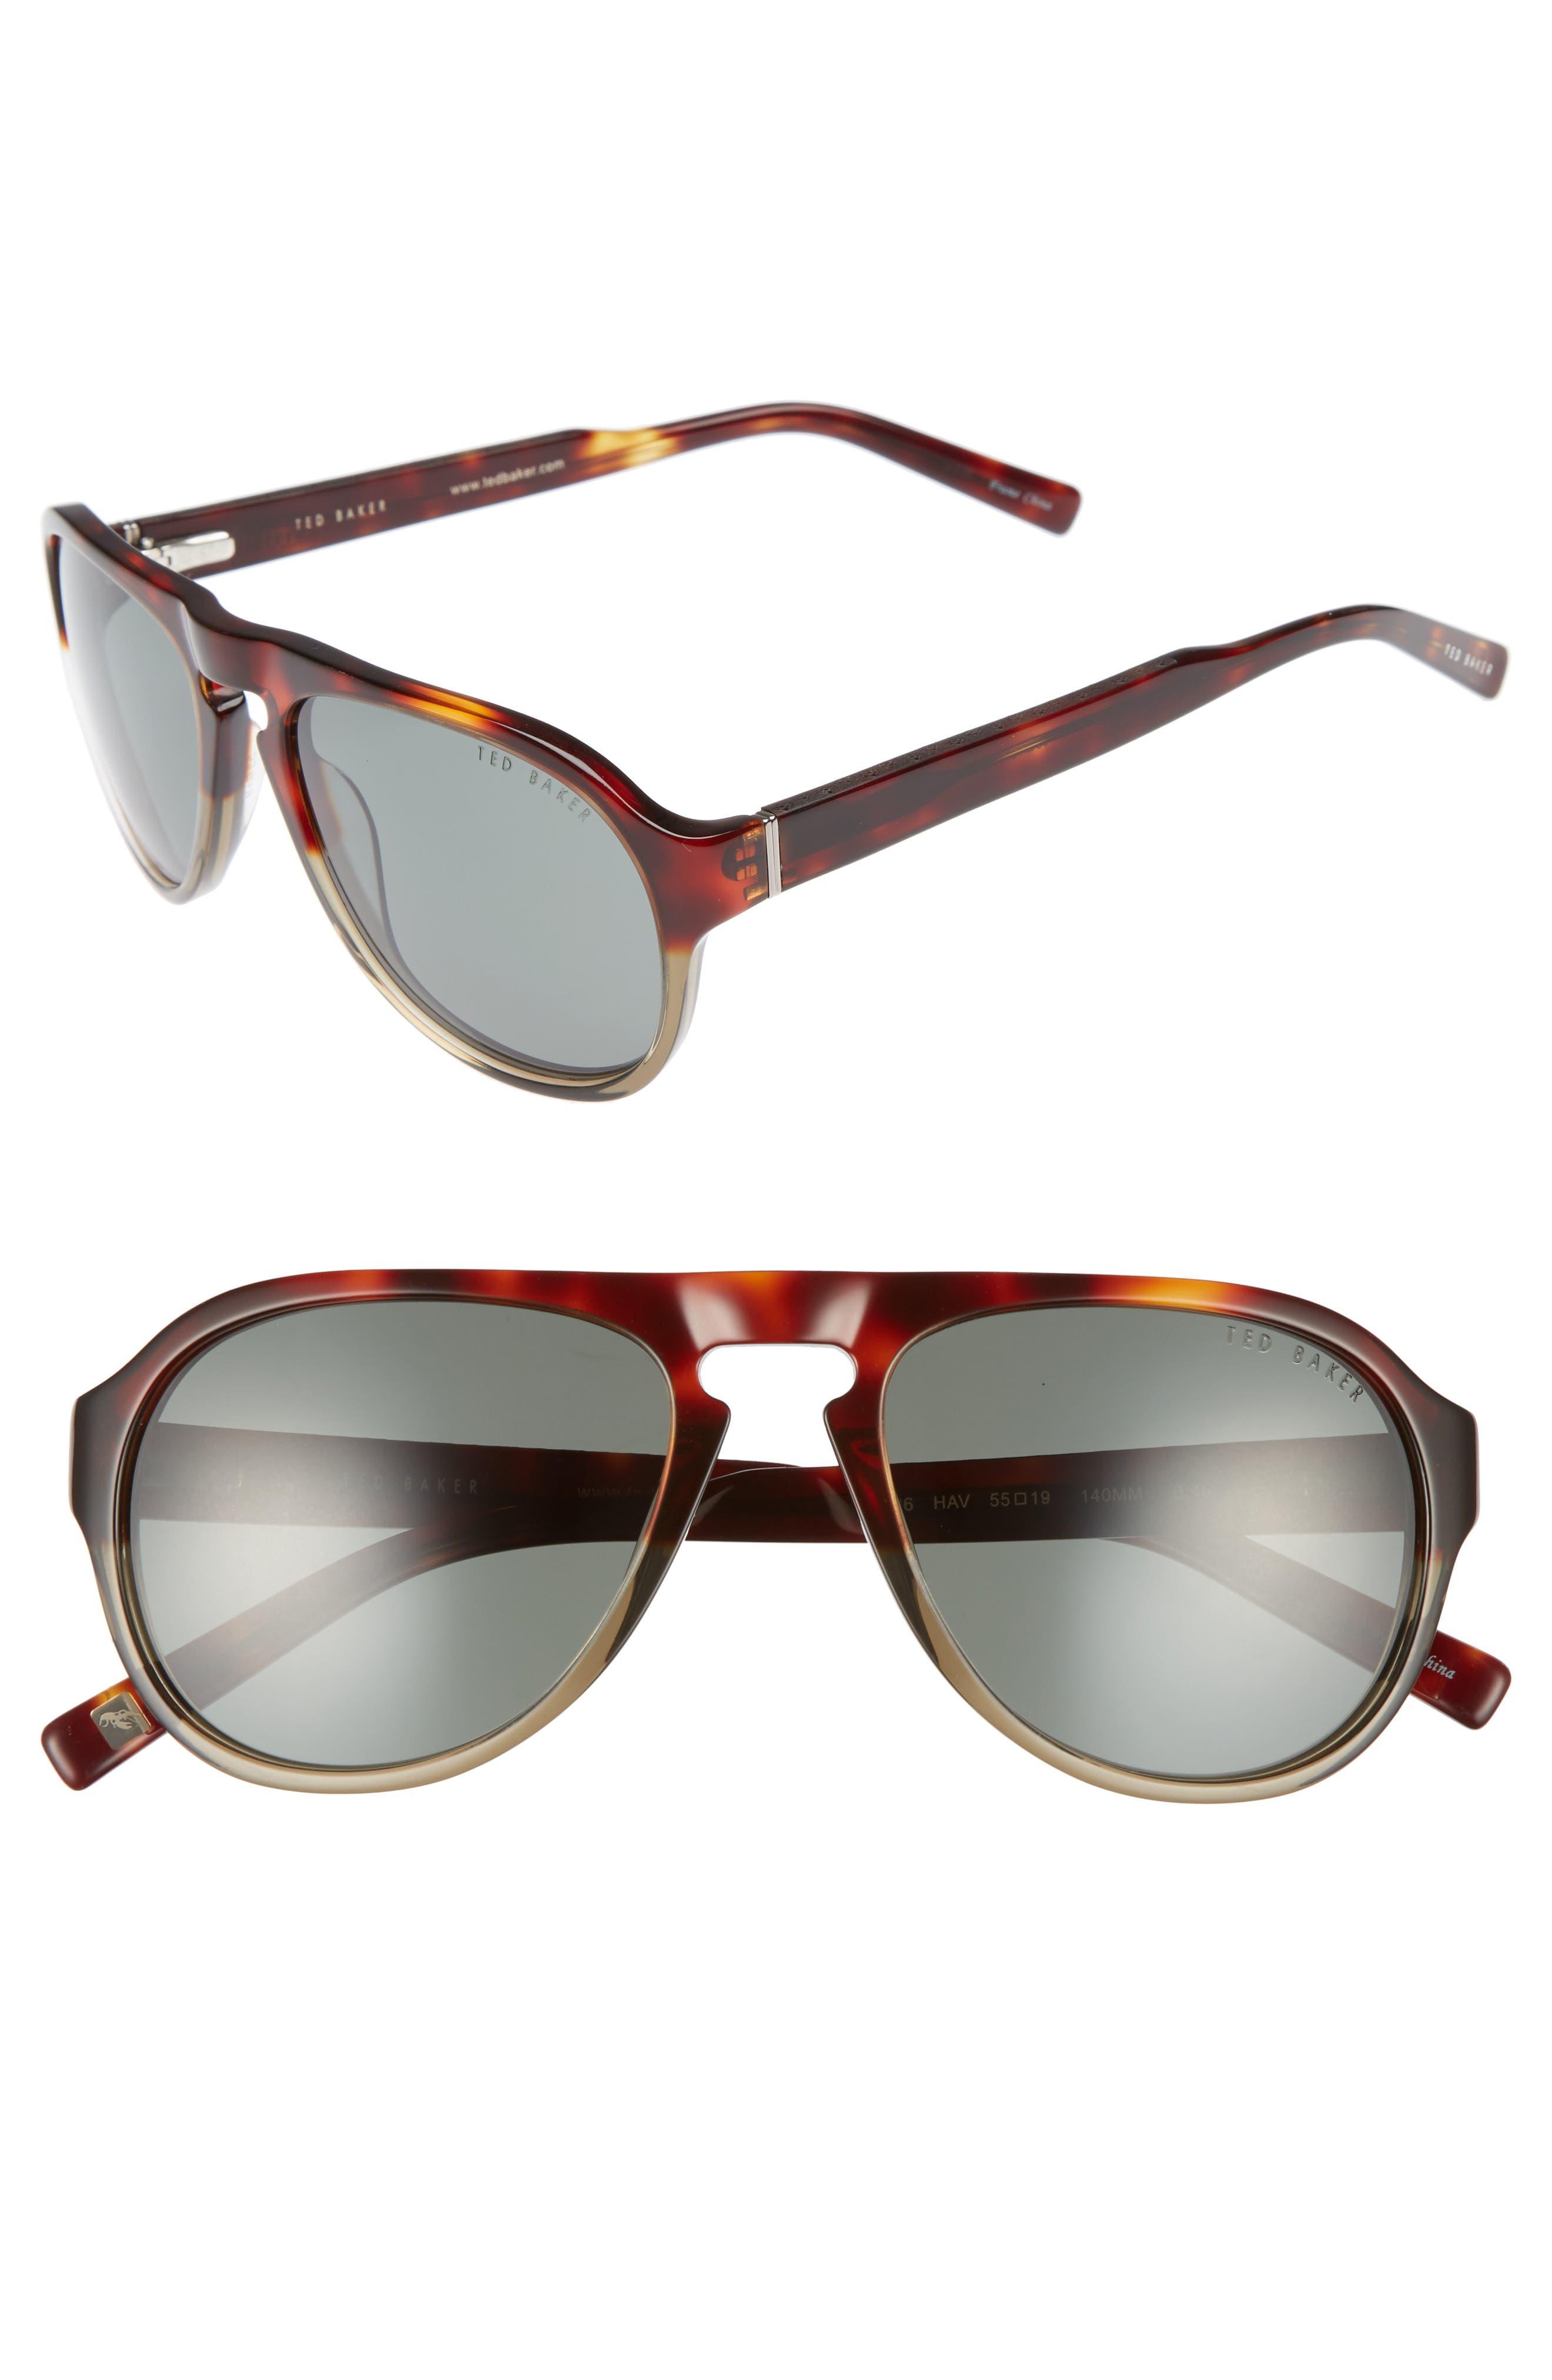 55mm Polarized Aviator Sunglasses,                             Main thumbnail 1, color,                             Tortoise Havana